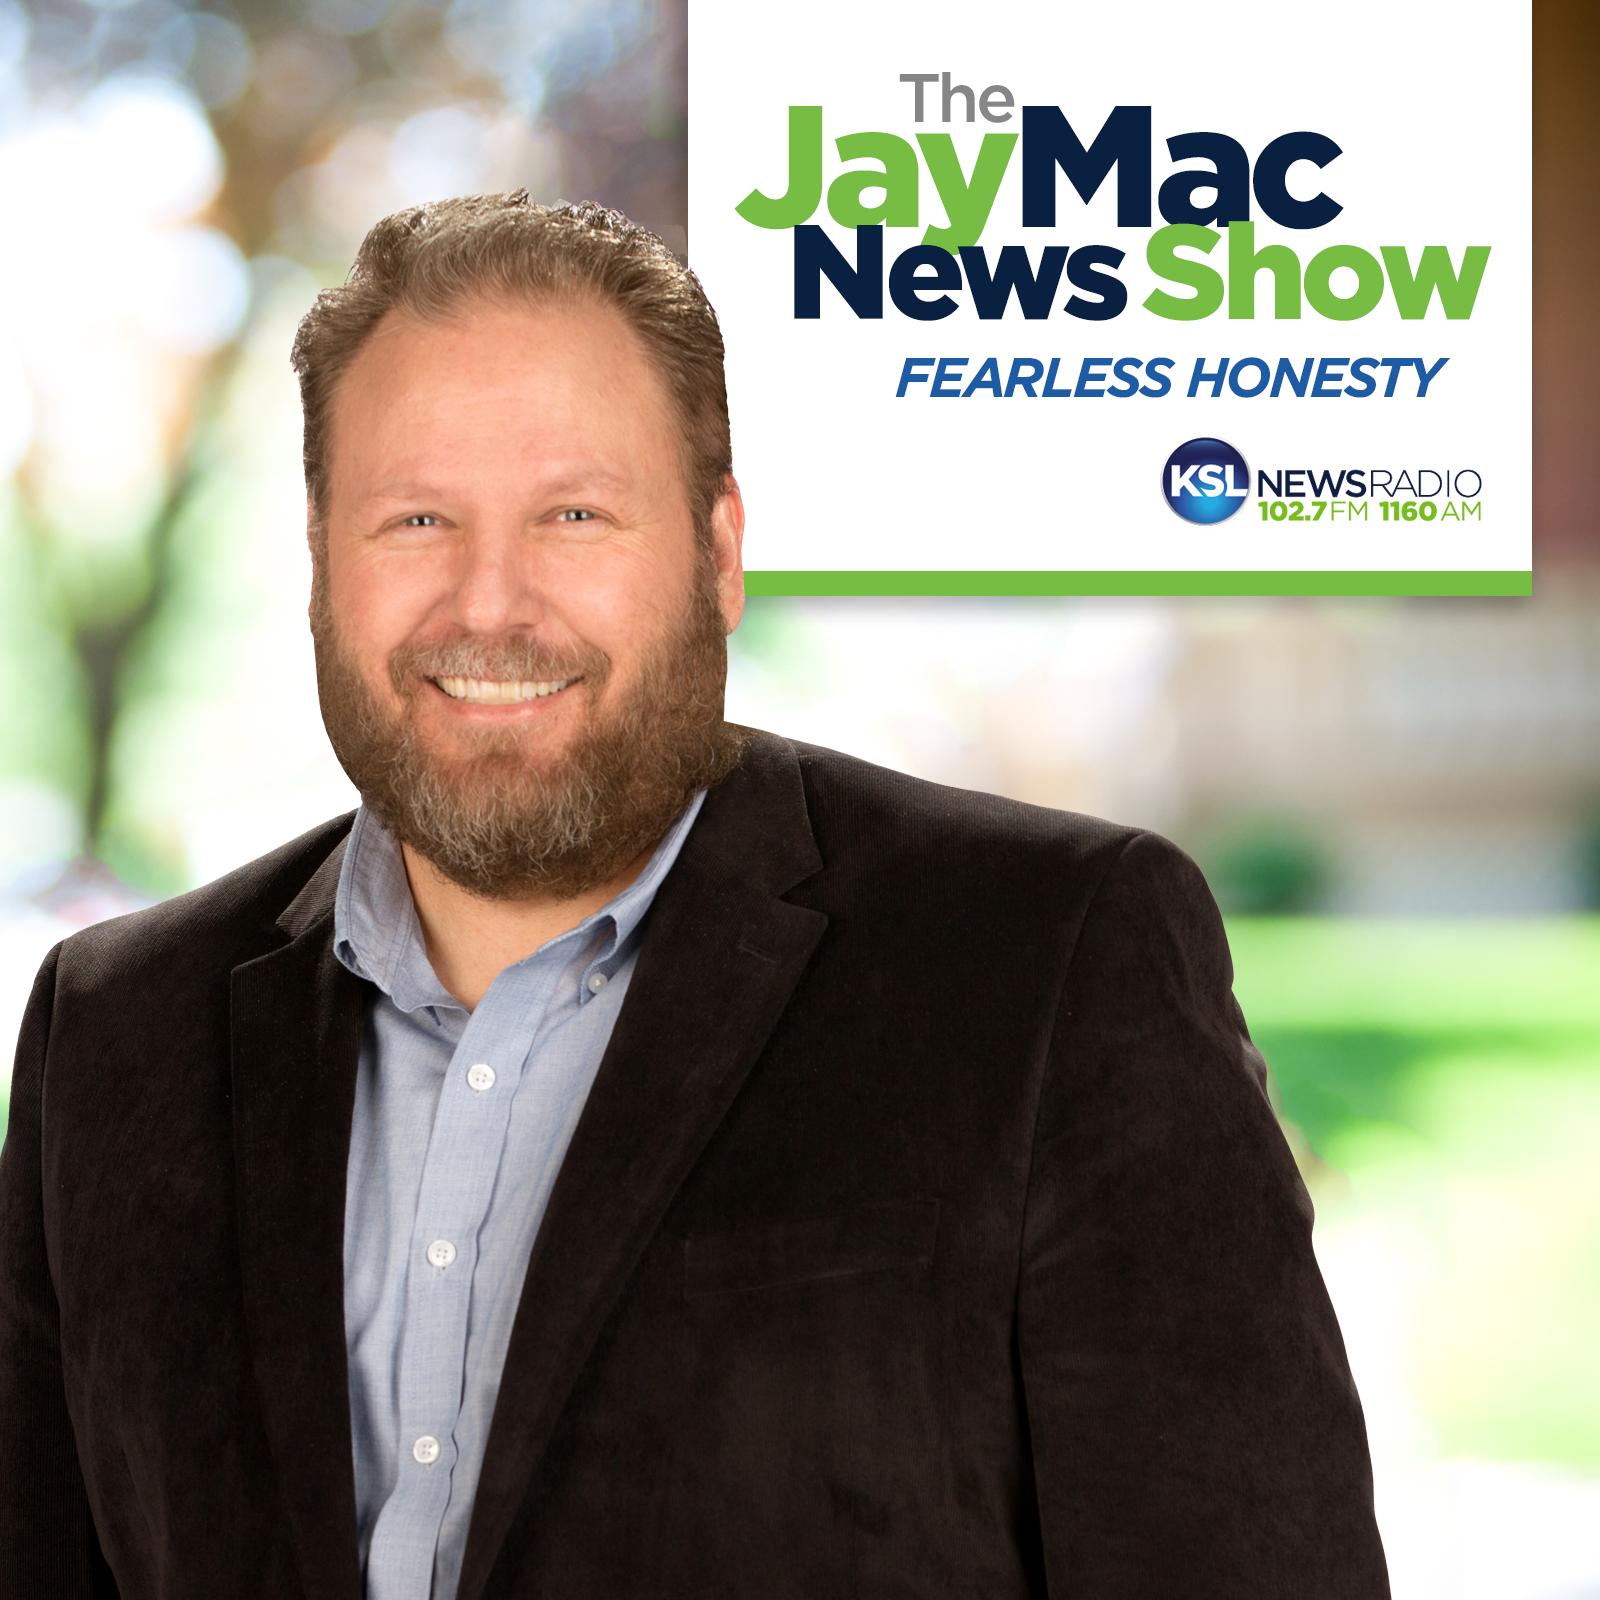 The JayMac News Show show art